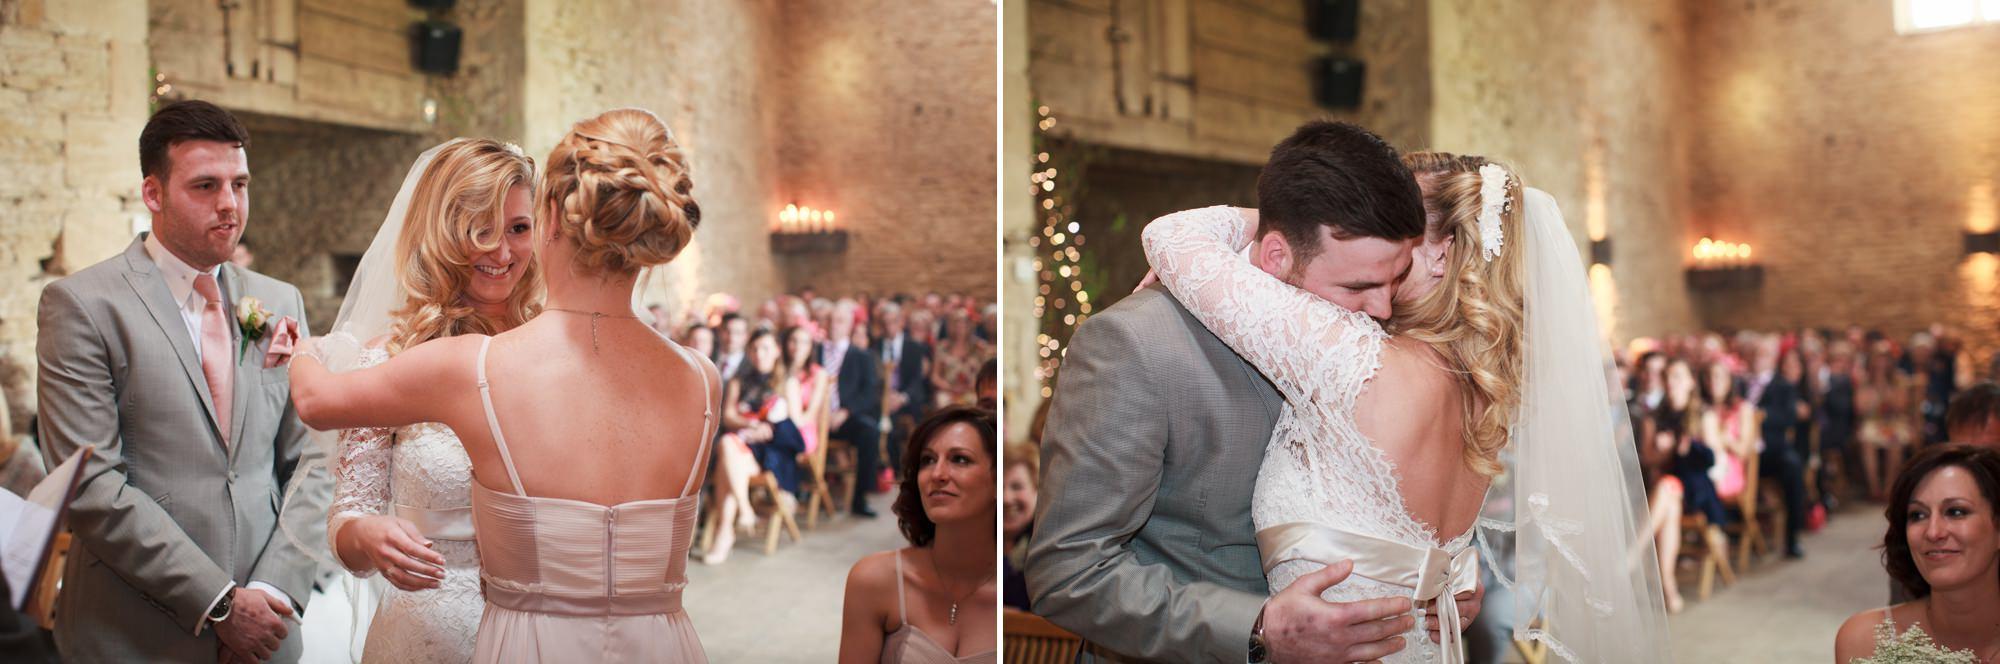 stone-barn-wedding-3